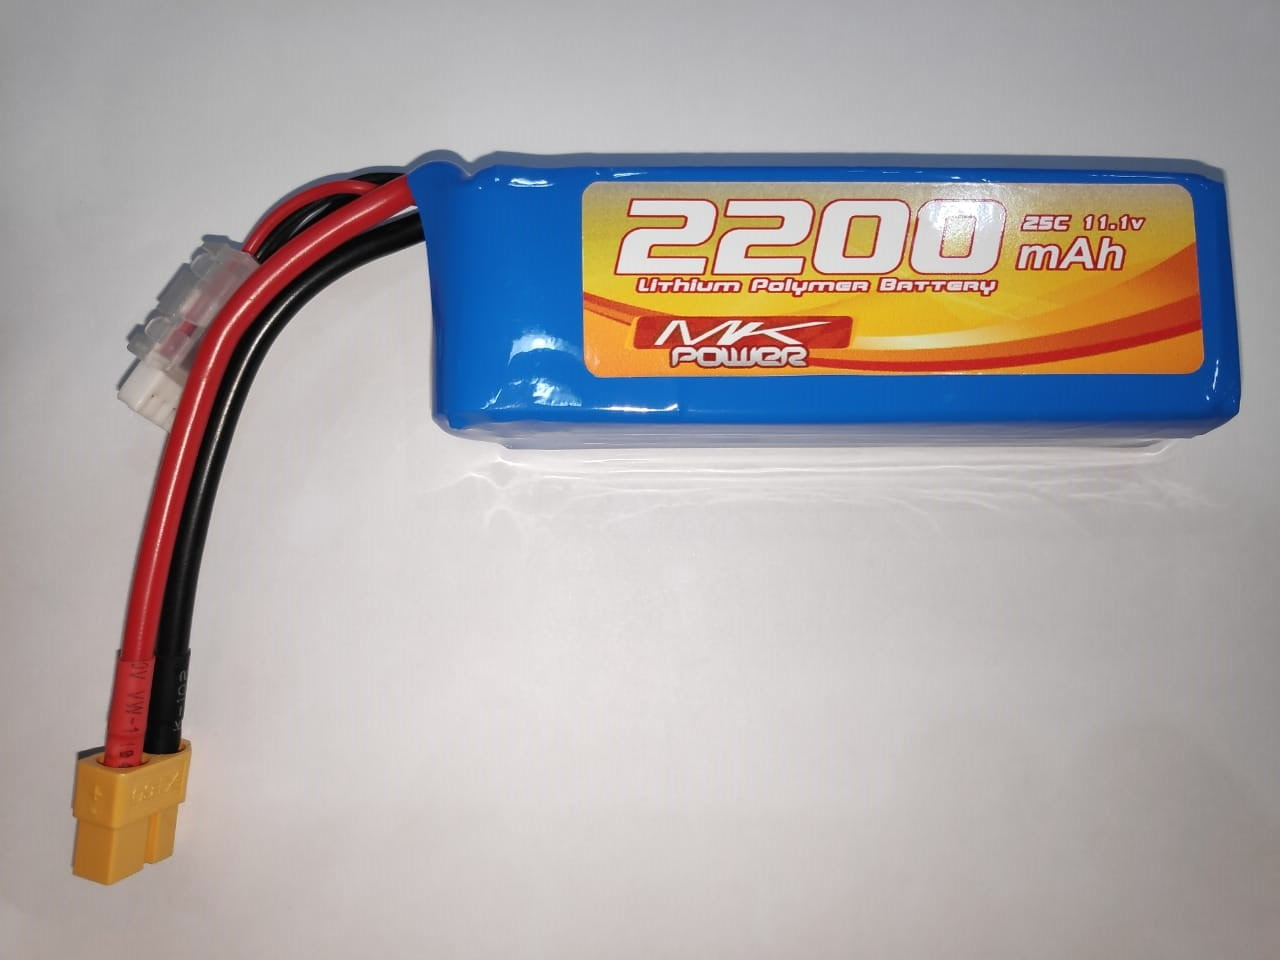 MK POWER - BATERIA LIPO 2200MAH 25C 11.1V 3S